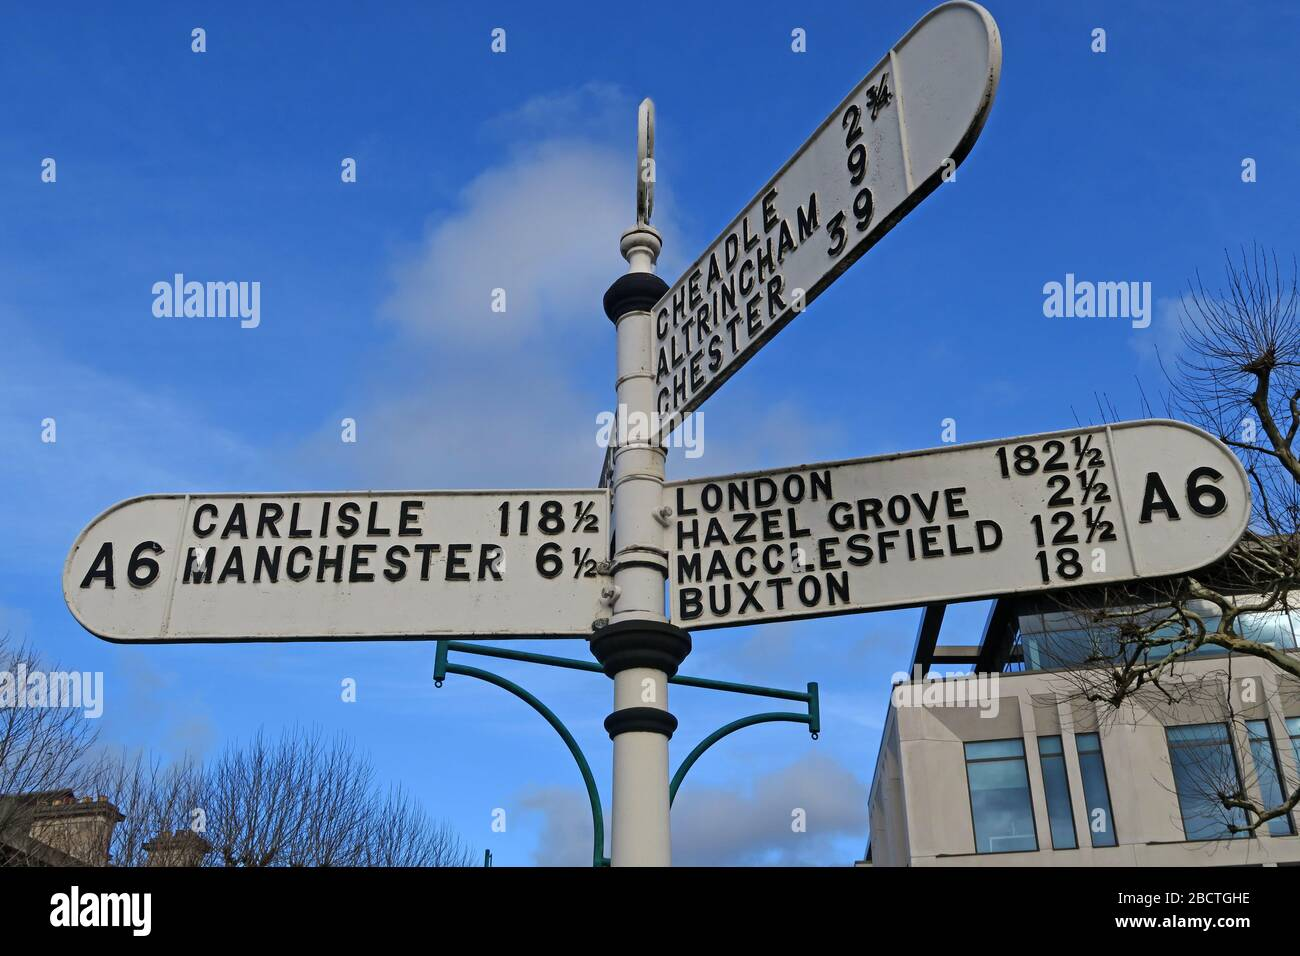 HotpixUK,@HotpixUk,GoTonySmith,Manchester,Cheshire,England,UK,town,white,sign,distances to,Carlisle,London,Hazel Grove,macclesfield,Buxton,Chester,Altrincham,Cheadle,Stockport.,Town Centre,Travel,Travellers,Traveling,tourist,tourism,destination,integrated,road network,north West,landmark,distance,SK1,Stockport Town Centre,guide post,heritage